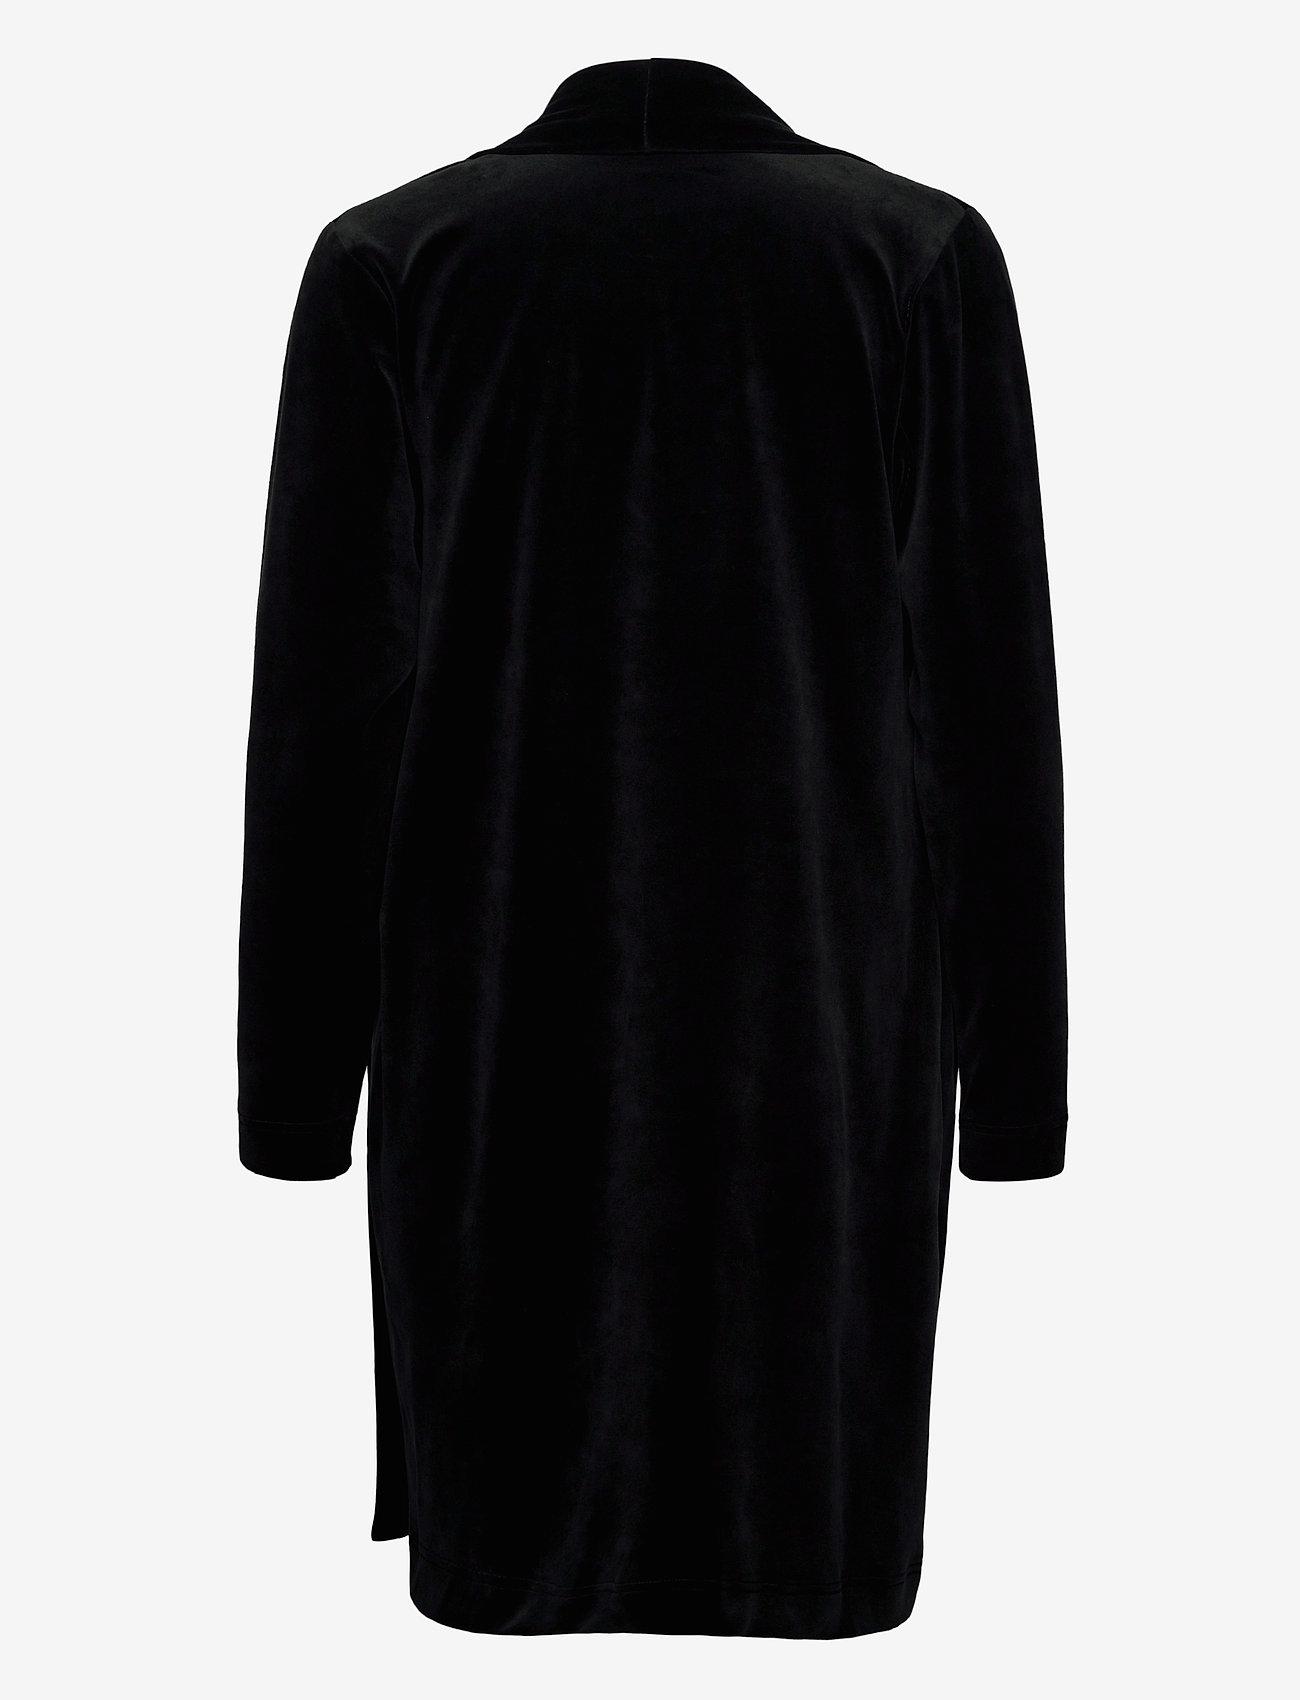 Nanso - Ladies dressing gown, Vivia - bathrobes - black - 1